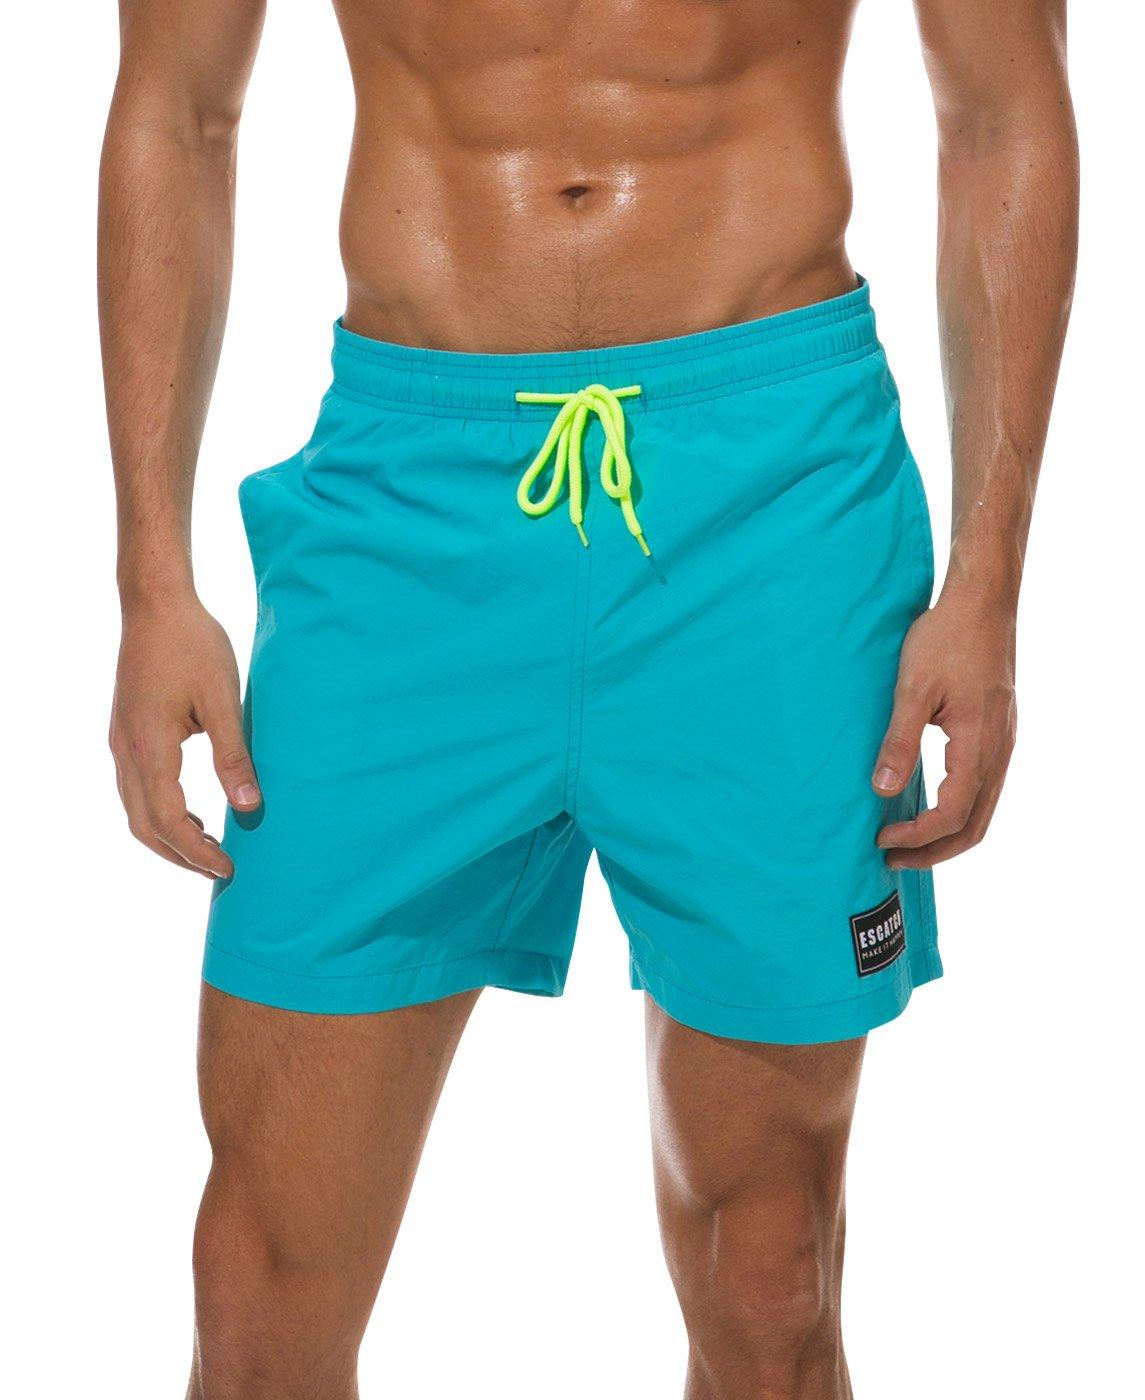 Mens Summer Swim Trunks Quick Dry Board Shorts Elastic Waist Soprts Shorts Above Knee Trunks for Surfing Running ESCATCH